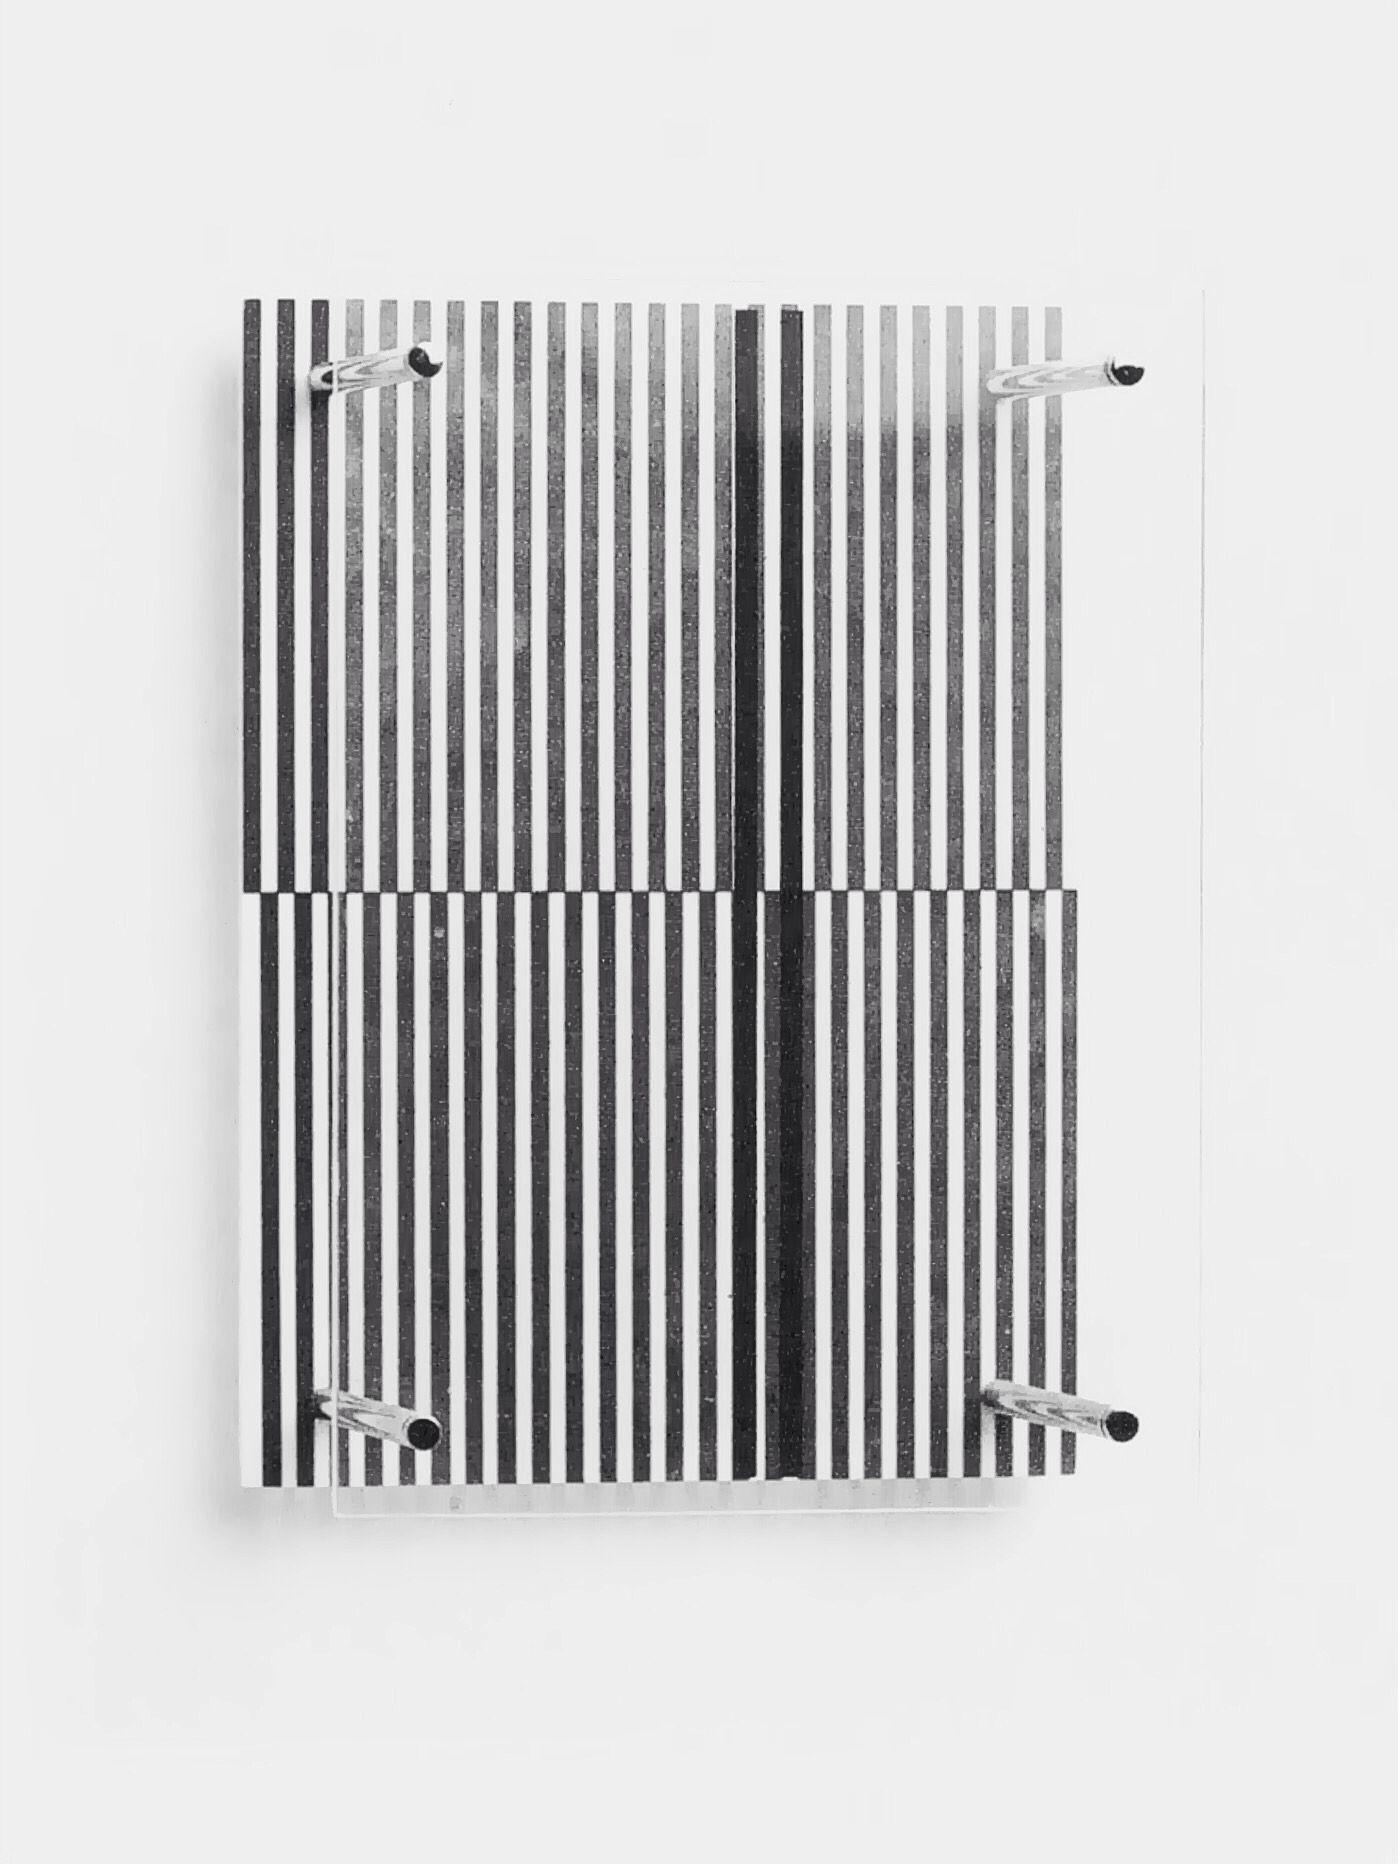 Jes S Rafael Soto B W Pinterest Art 3d And 3d # Muebles Sotoplus